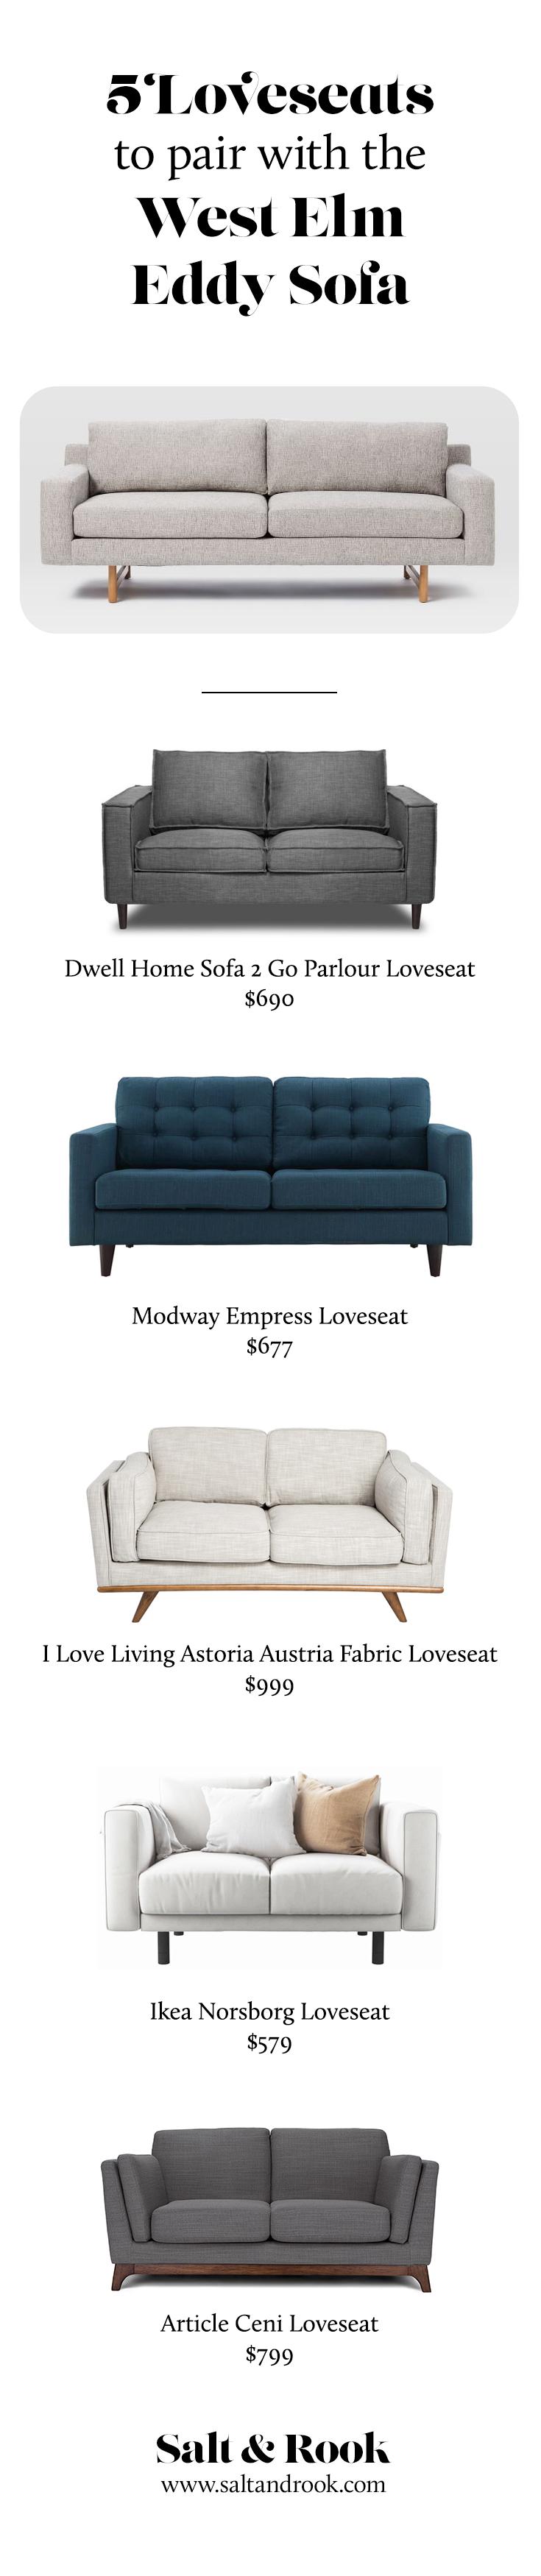 5-loveseats-pair-with-eddy-sofa-west-elm.jpg